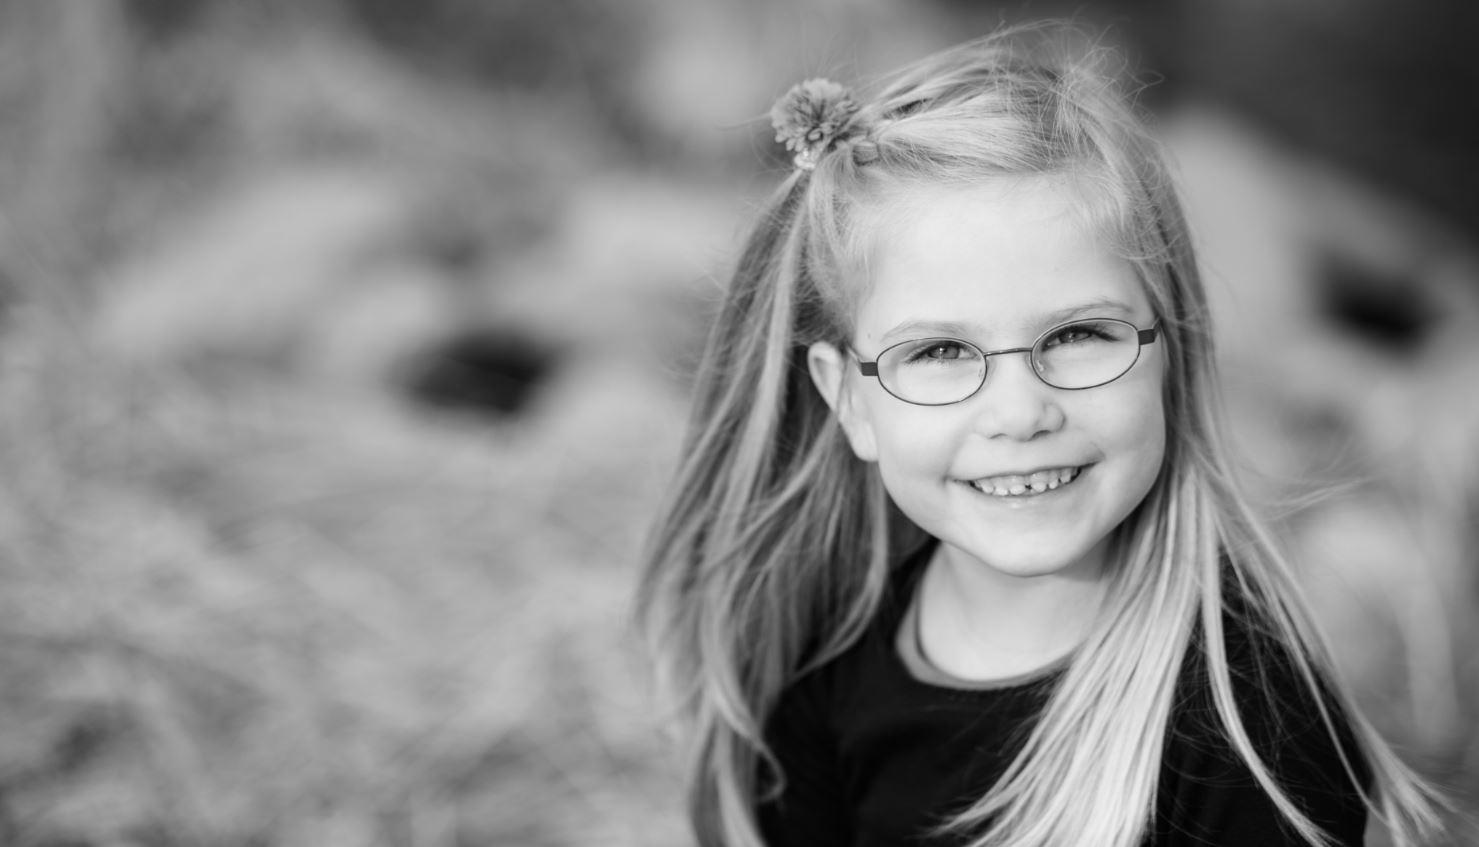 bf34d9747ac Designer Eyeglasses   Frames For Kids